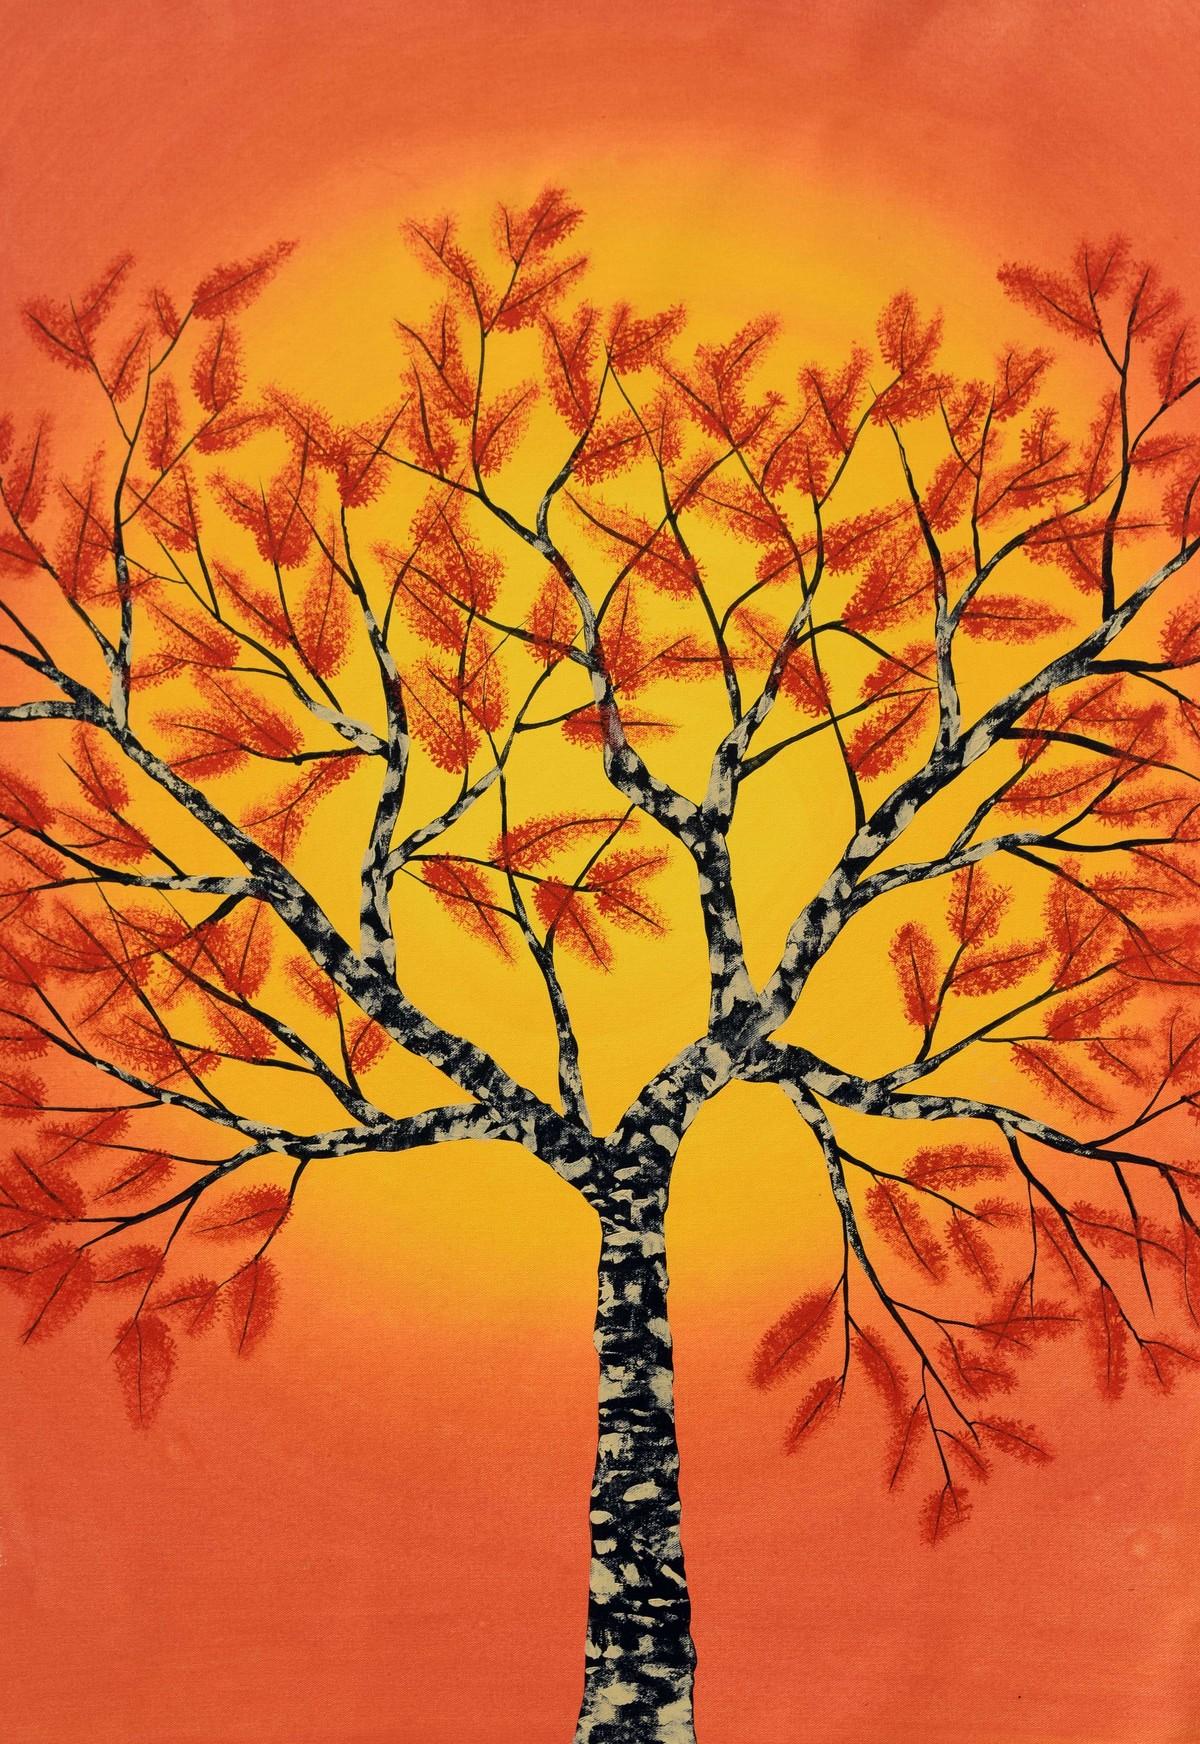 Sambharv By Artist Sumit Mehndiratta Decorative Painting Mojarto 217819